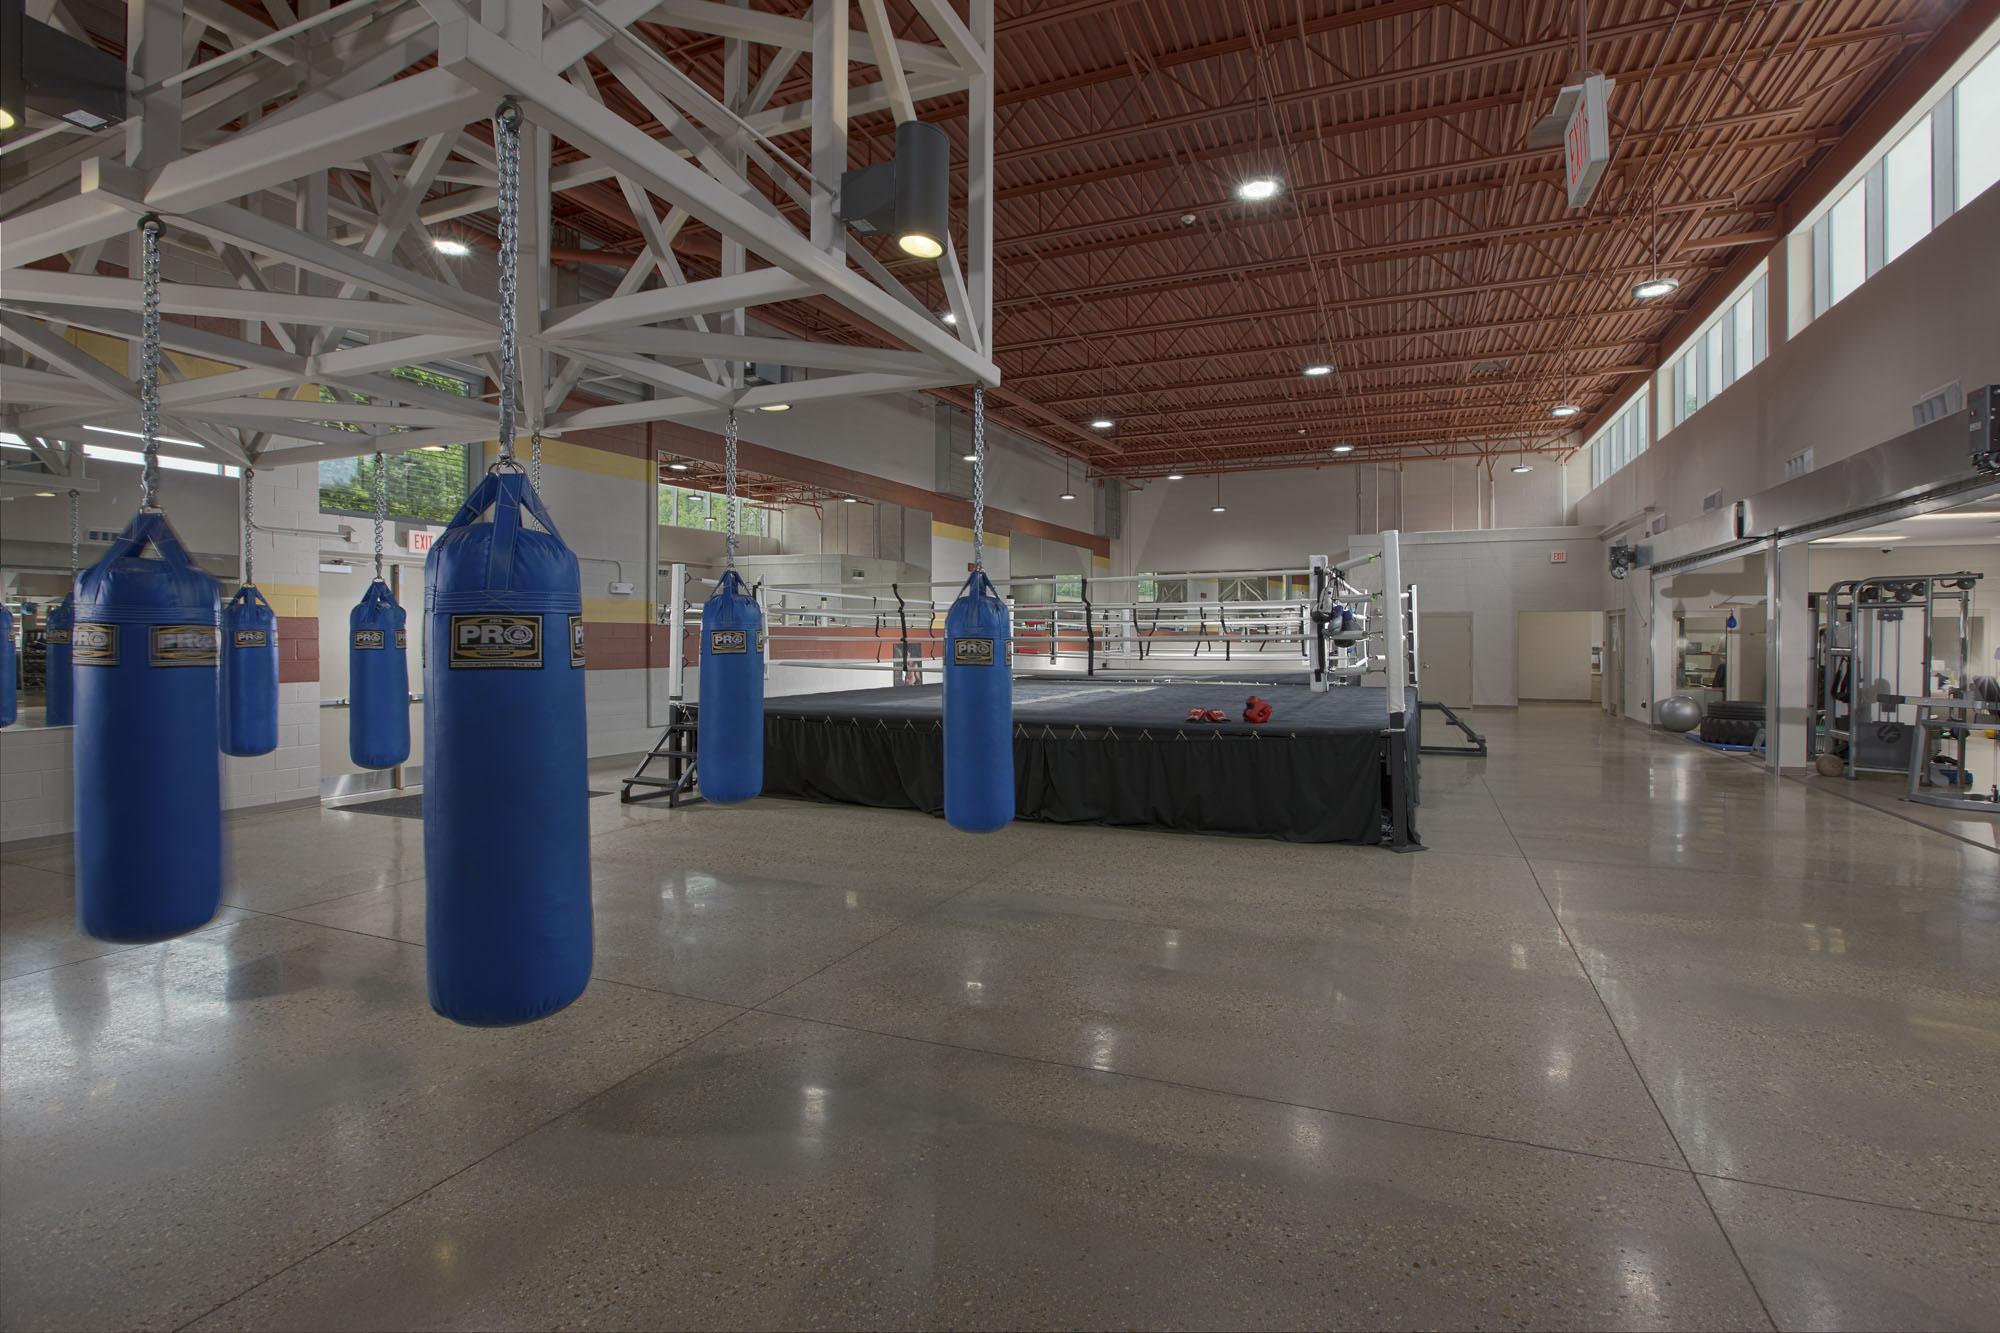 Bald Eagle Rec Center Interior Image-145395.jpg